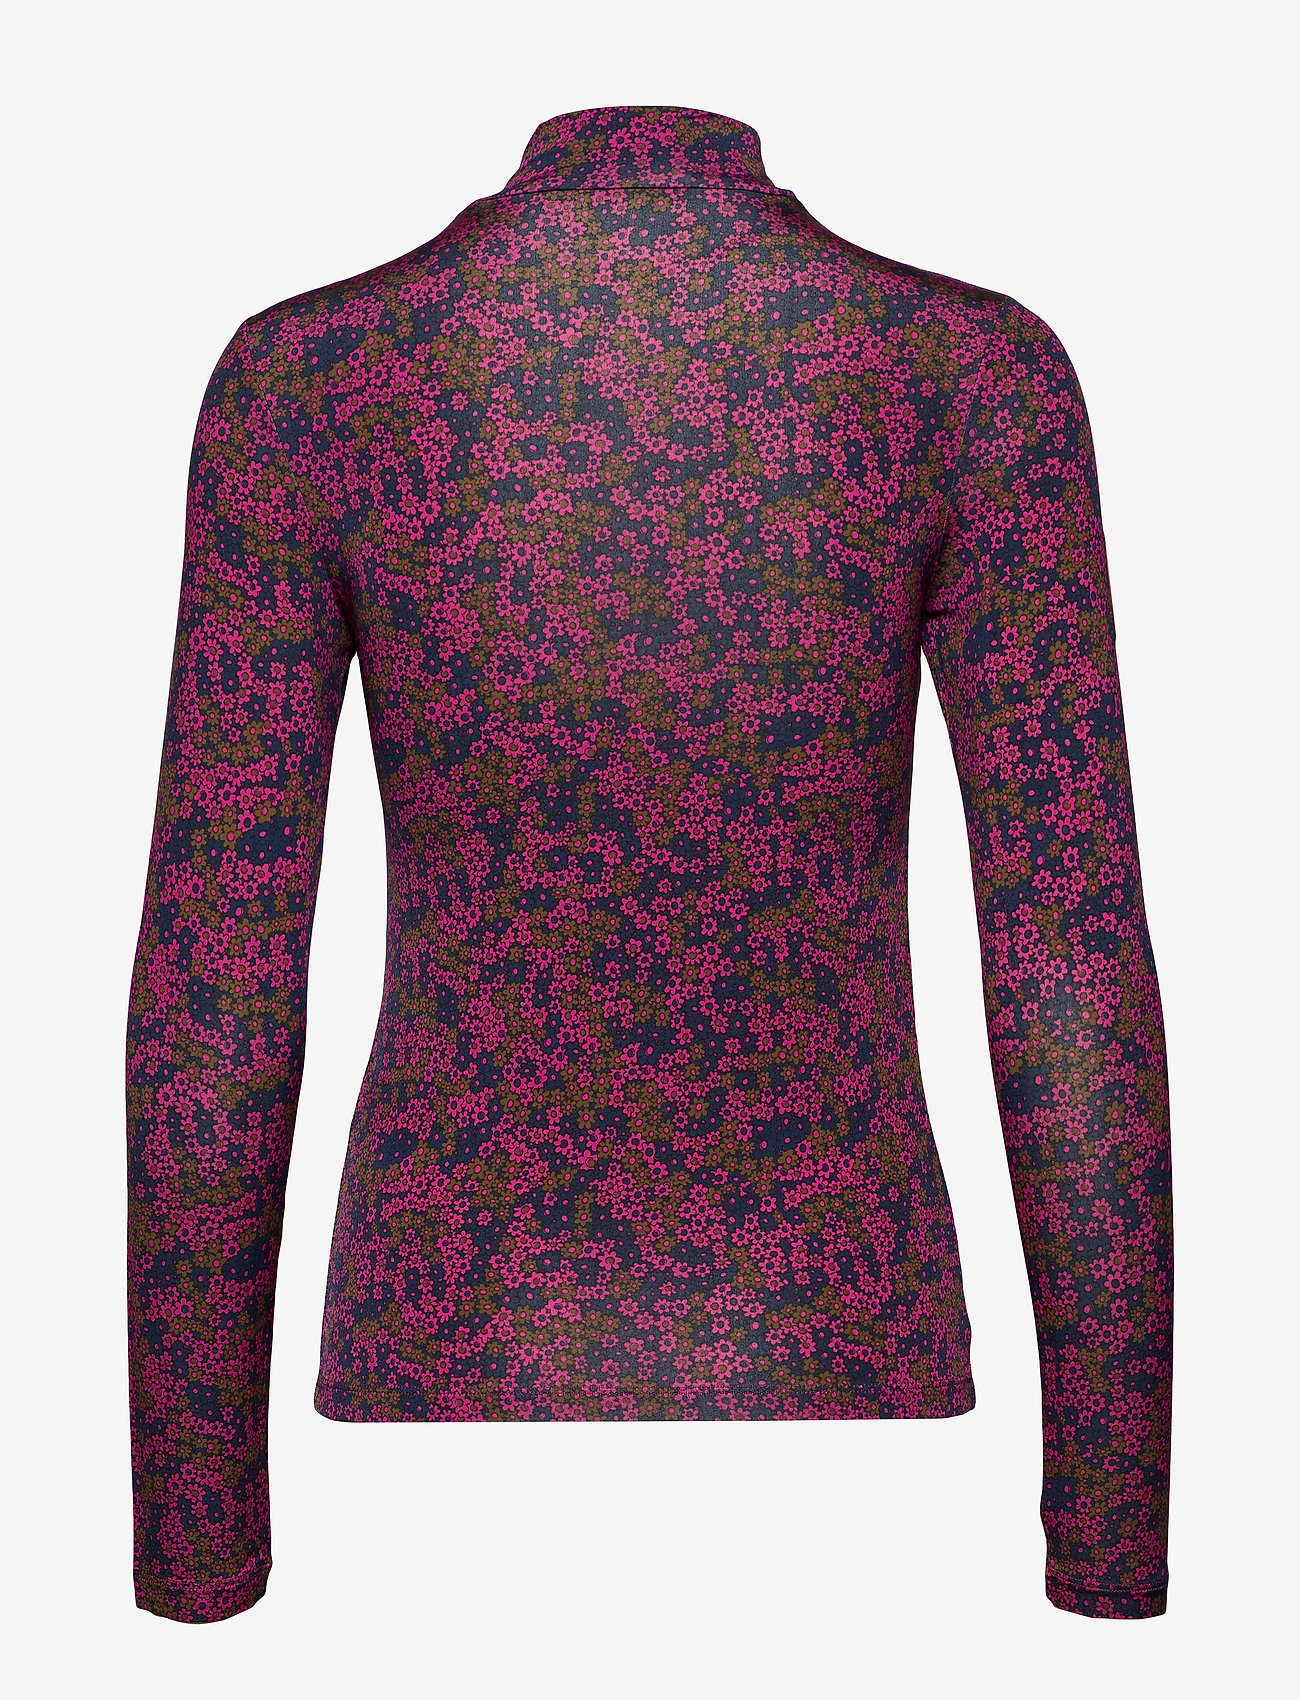 Samsøe Samsøe Elsi t-n t-shirt ls aop 10908 - T-shirty i zopy MOONLIGHT FLOWER - Kobiety Odzież.